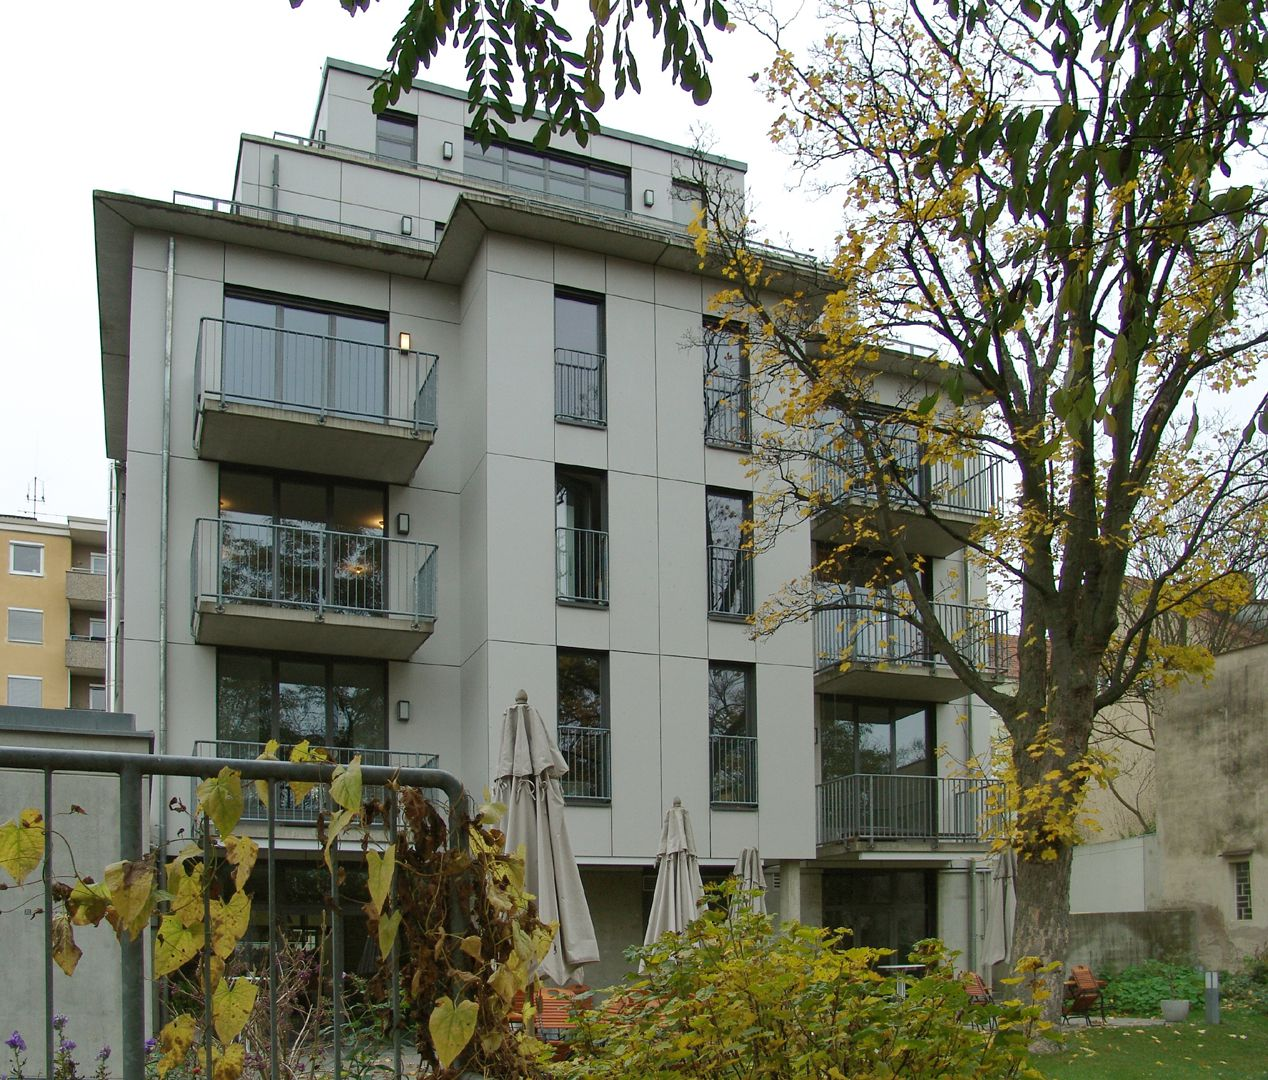 Zumikon Südfassade